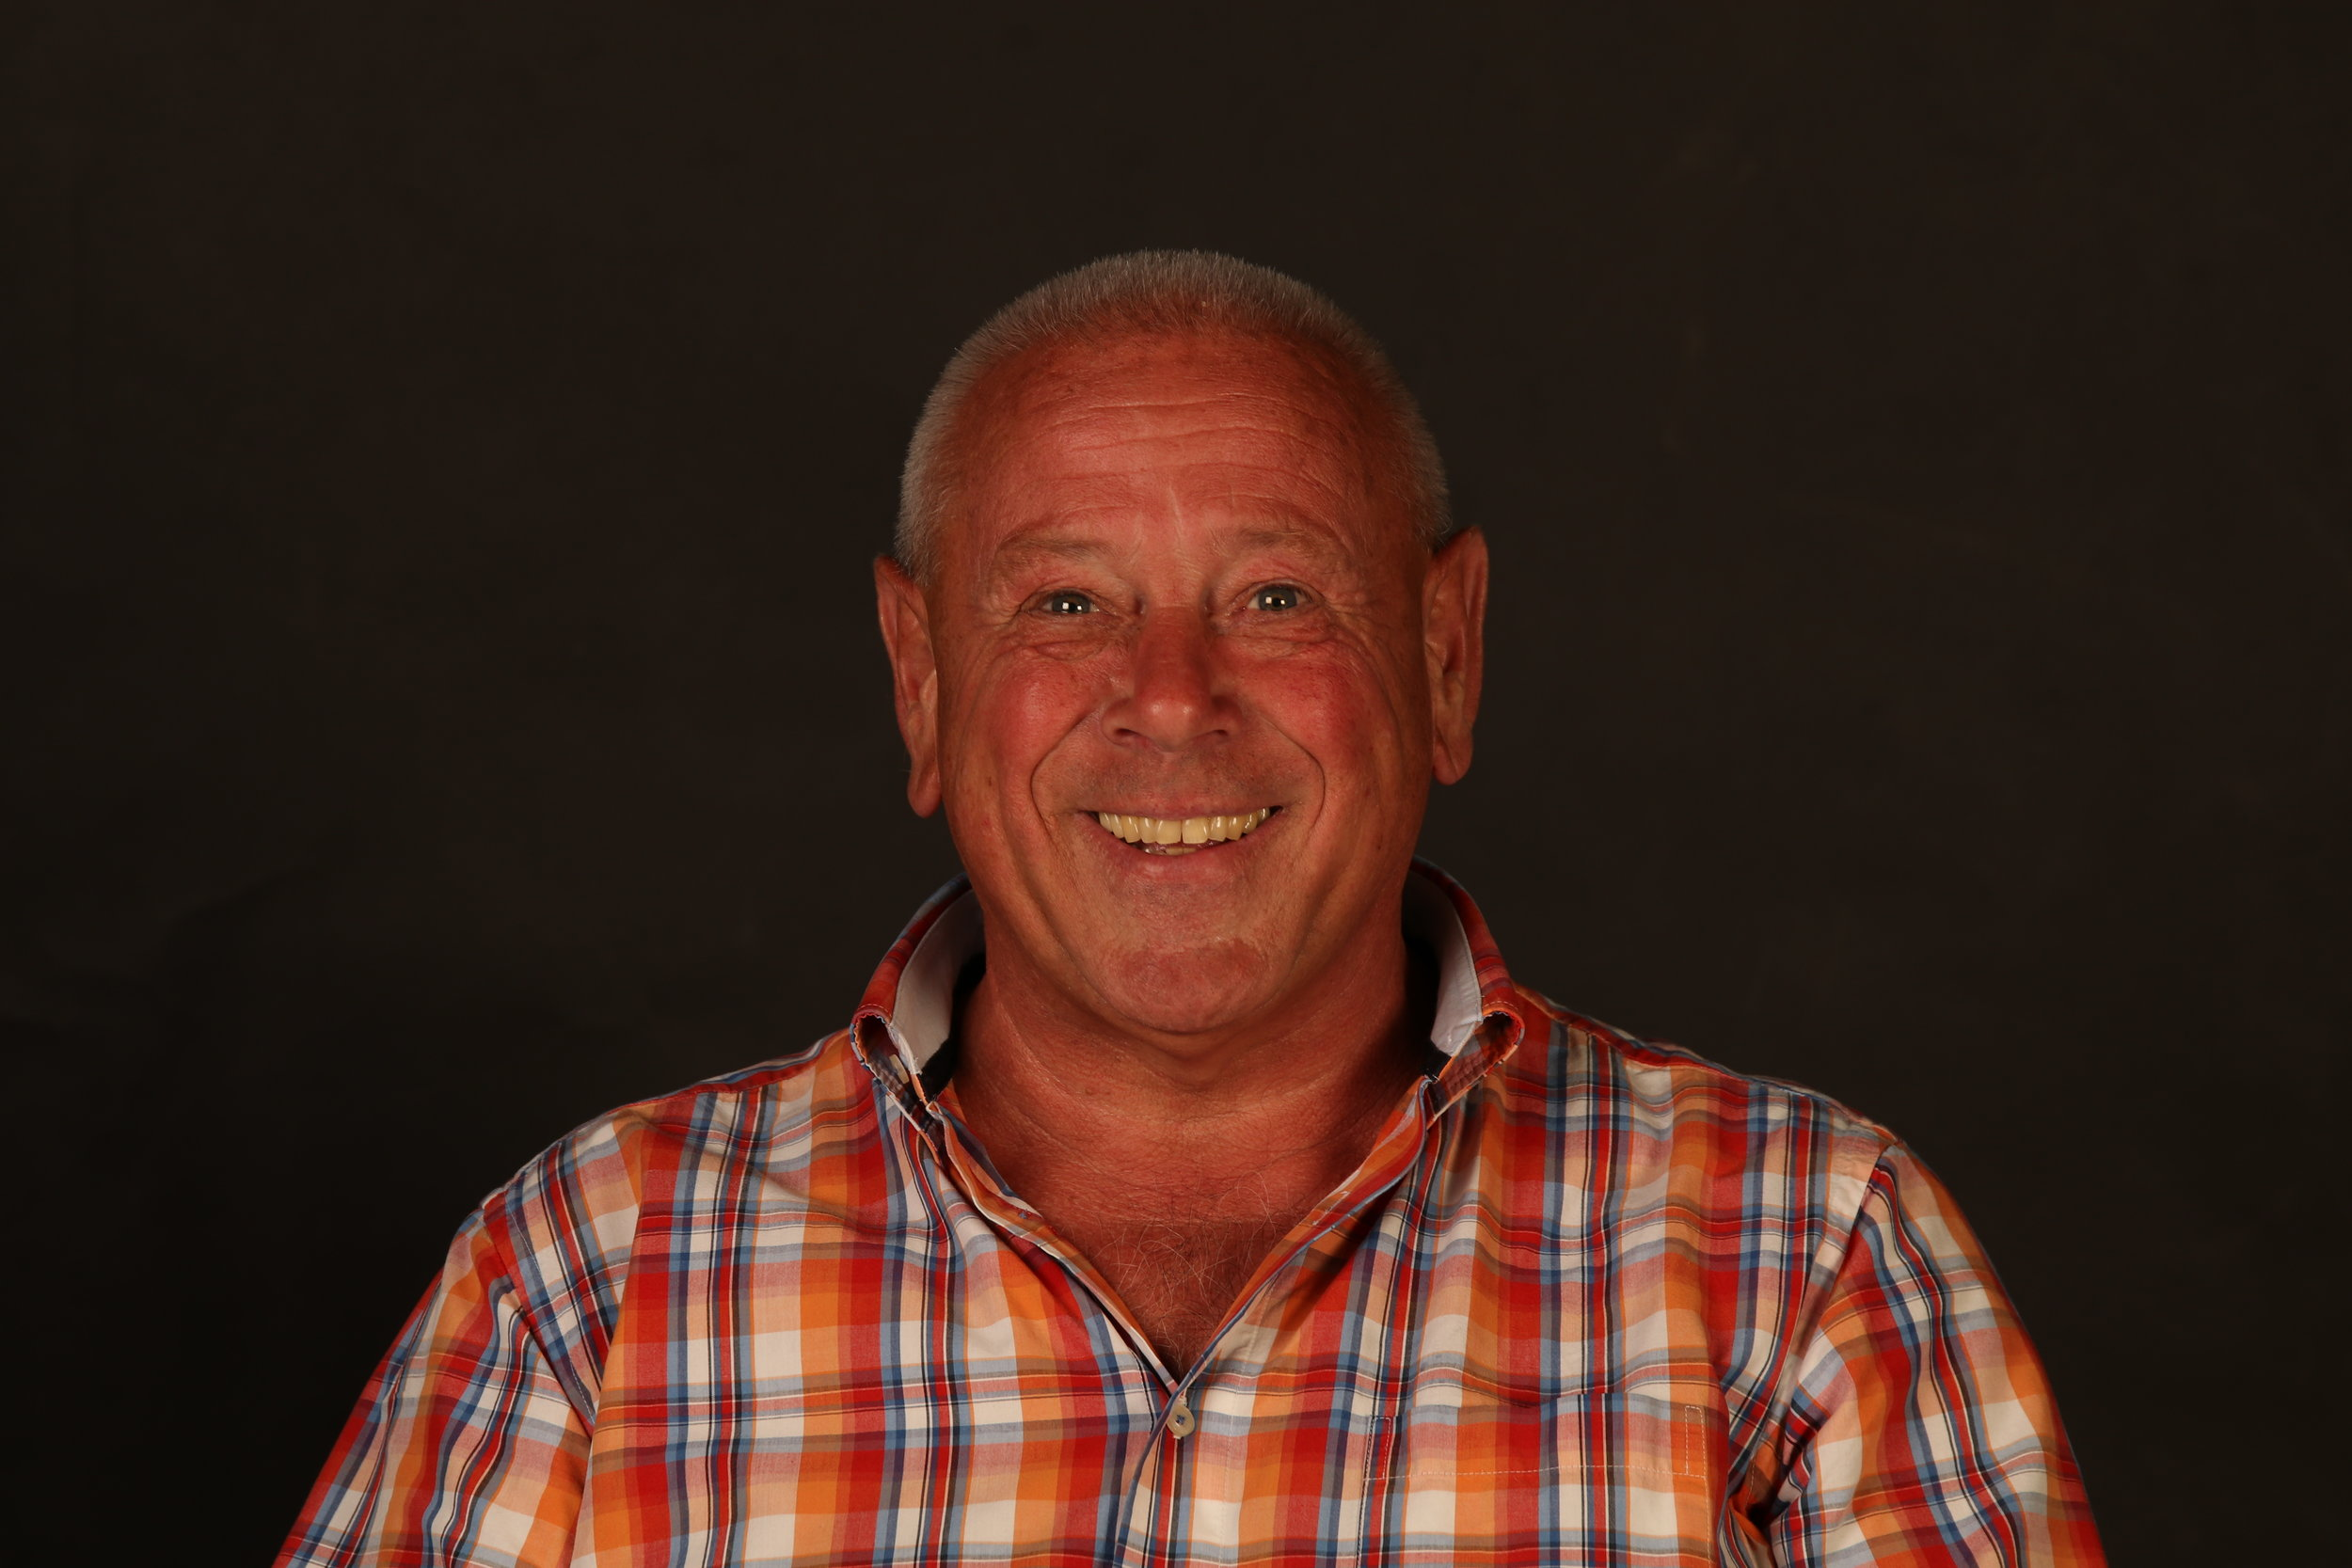 Cees Ooms, clubkampioen 2018